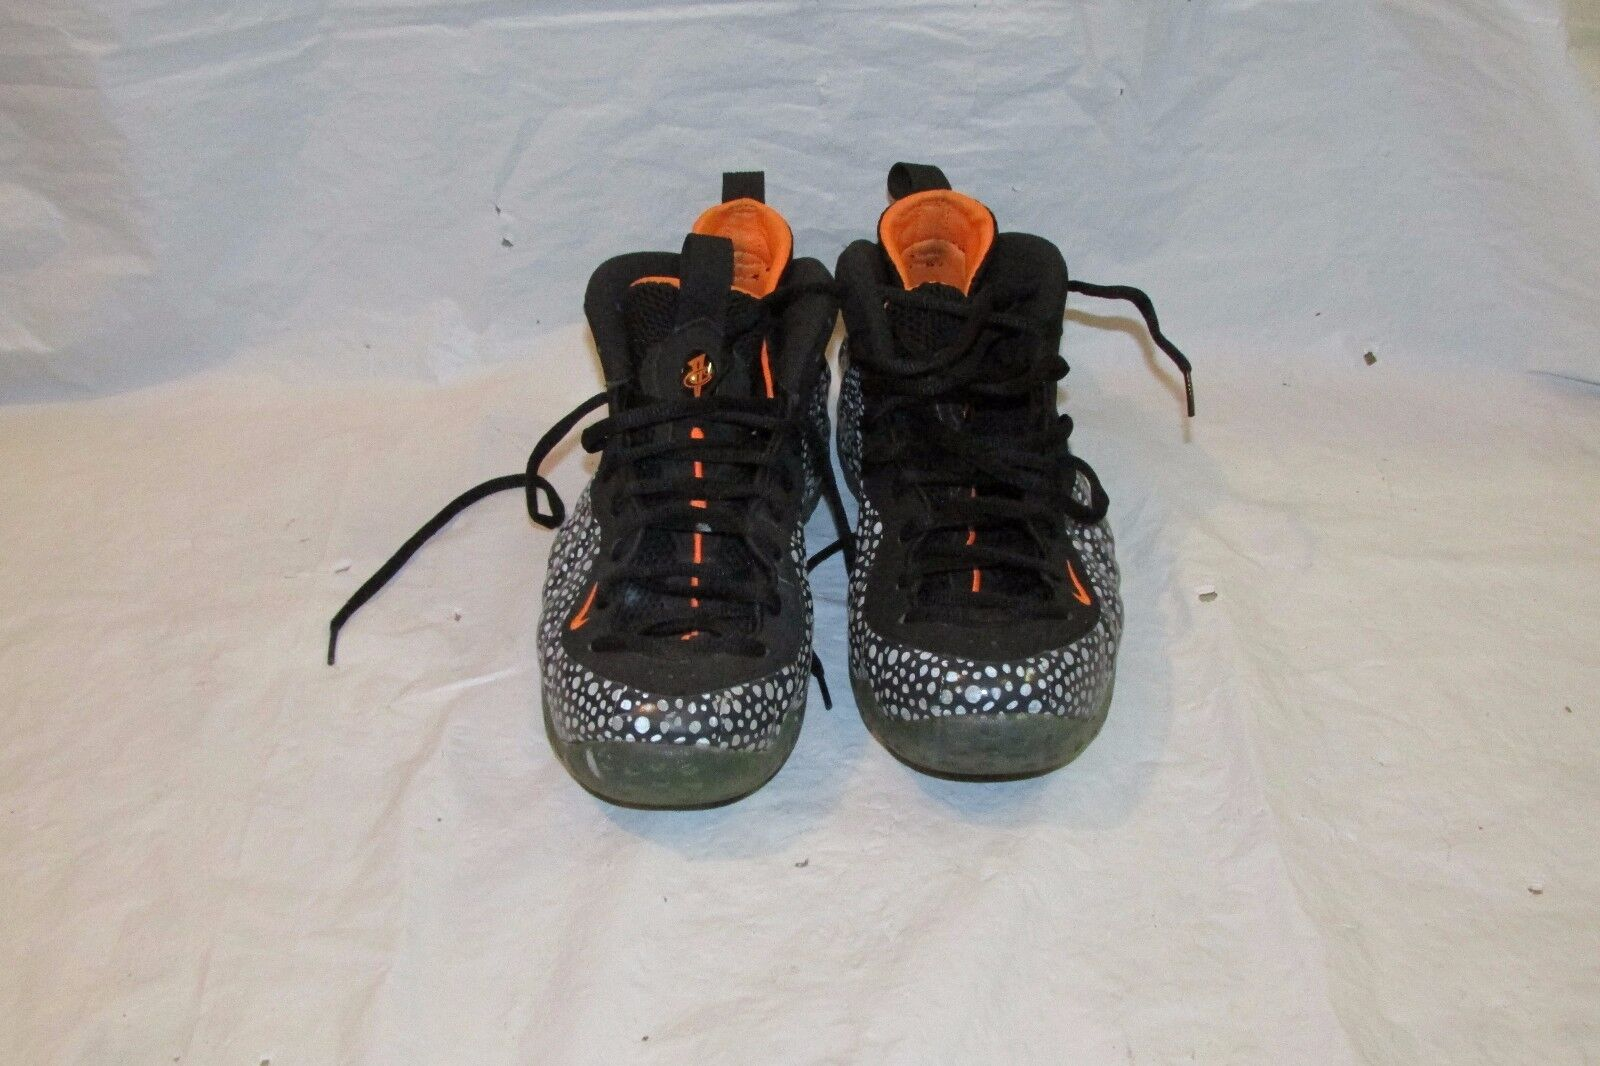 a19cc45177ddc Nike Air Foamposite One One One PRM Safari Mens Basketball Shoes Size 11.5  575420-003